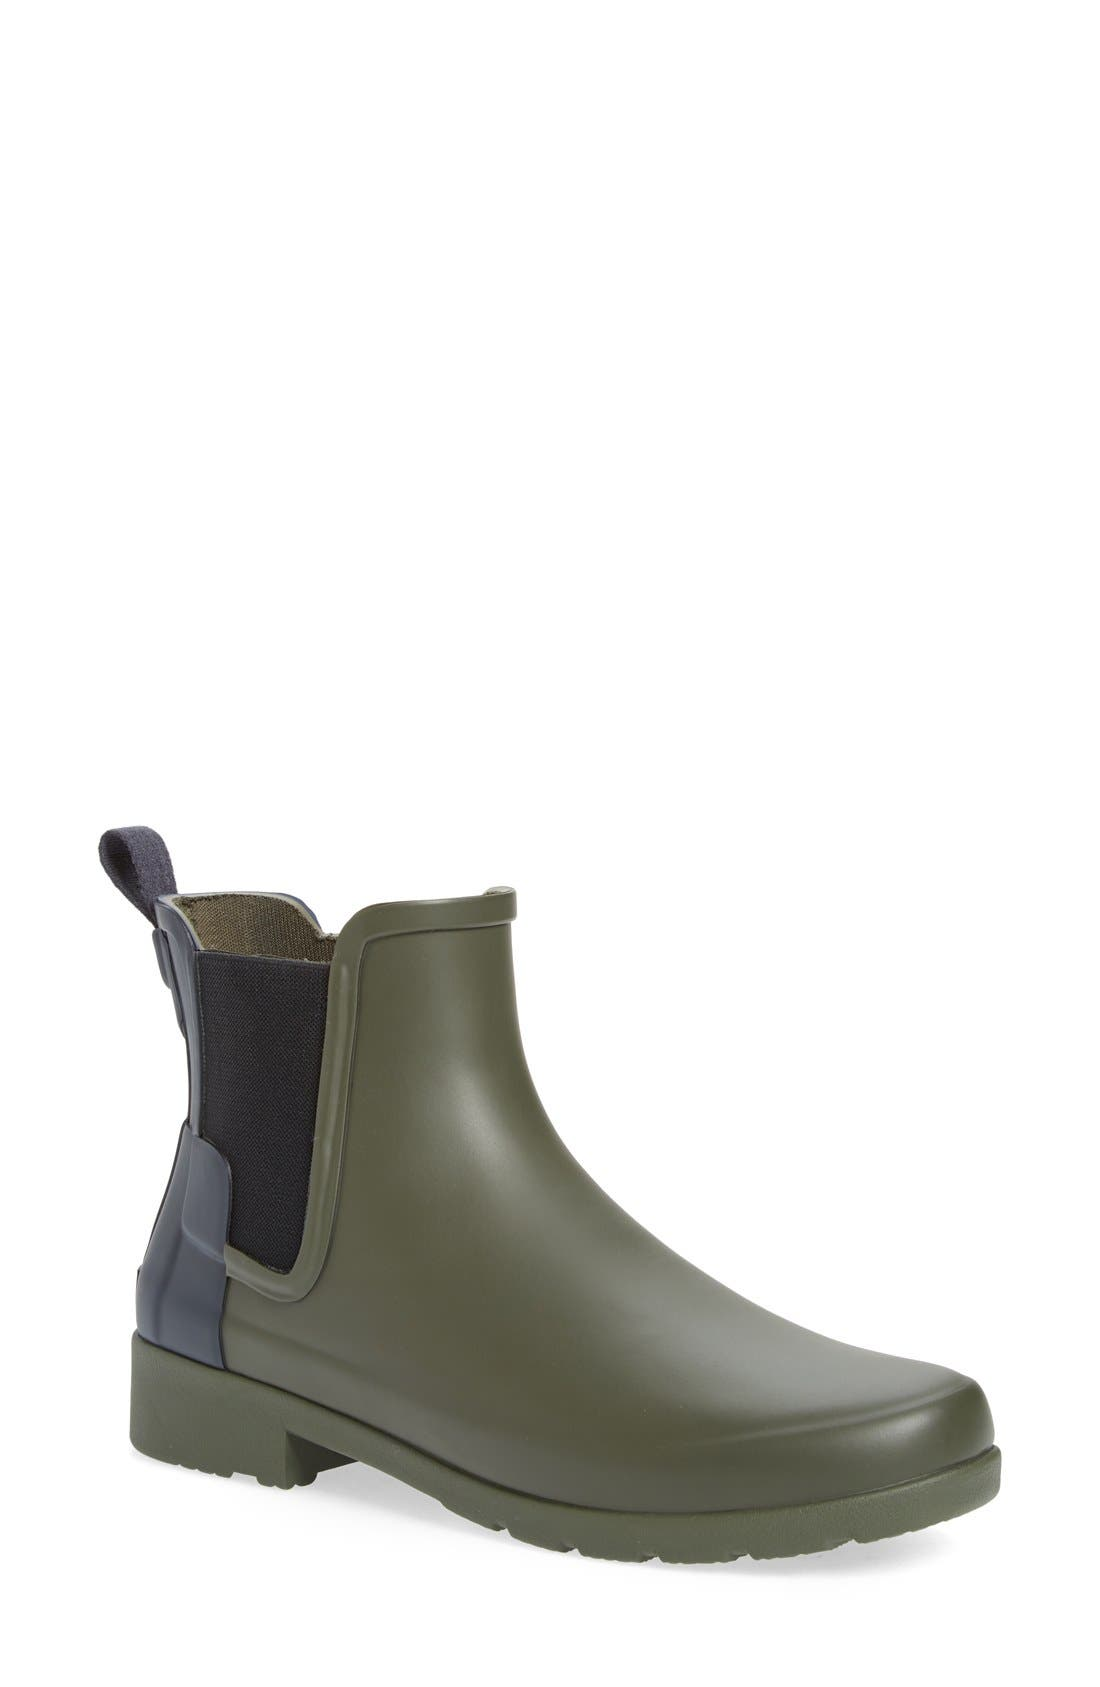 Main Image - Hunter 'Refined - Chelsea' Two-Tone Boot (Women)